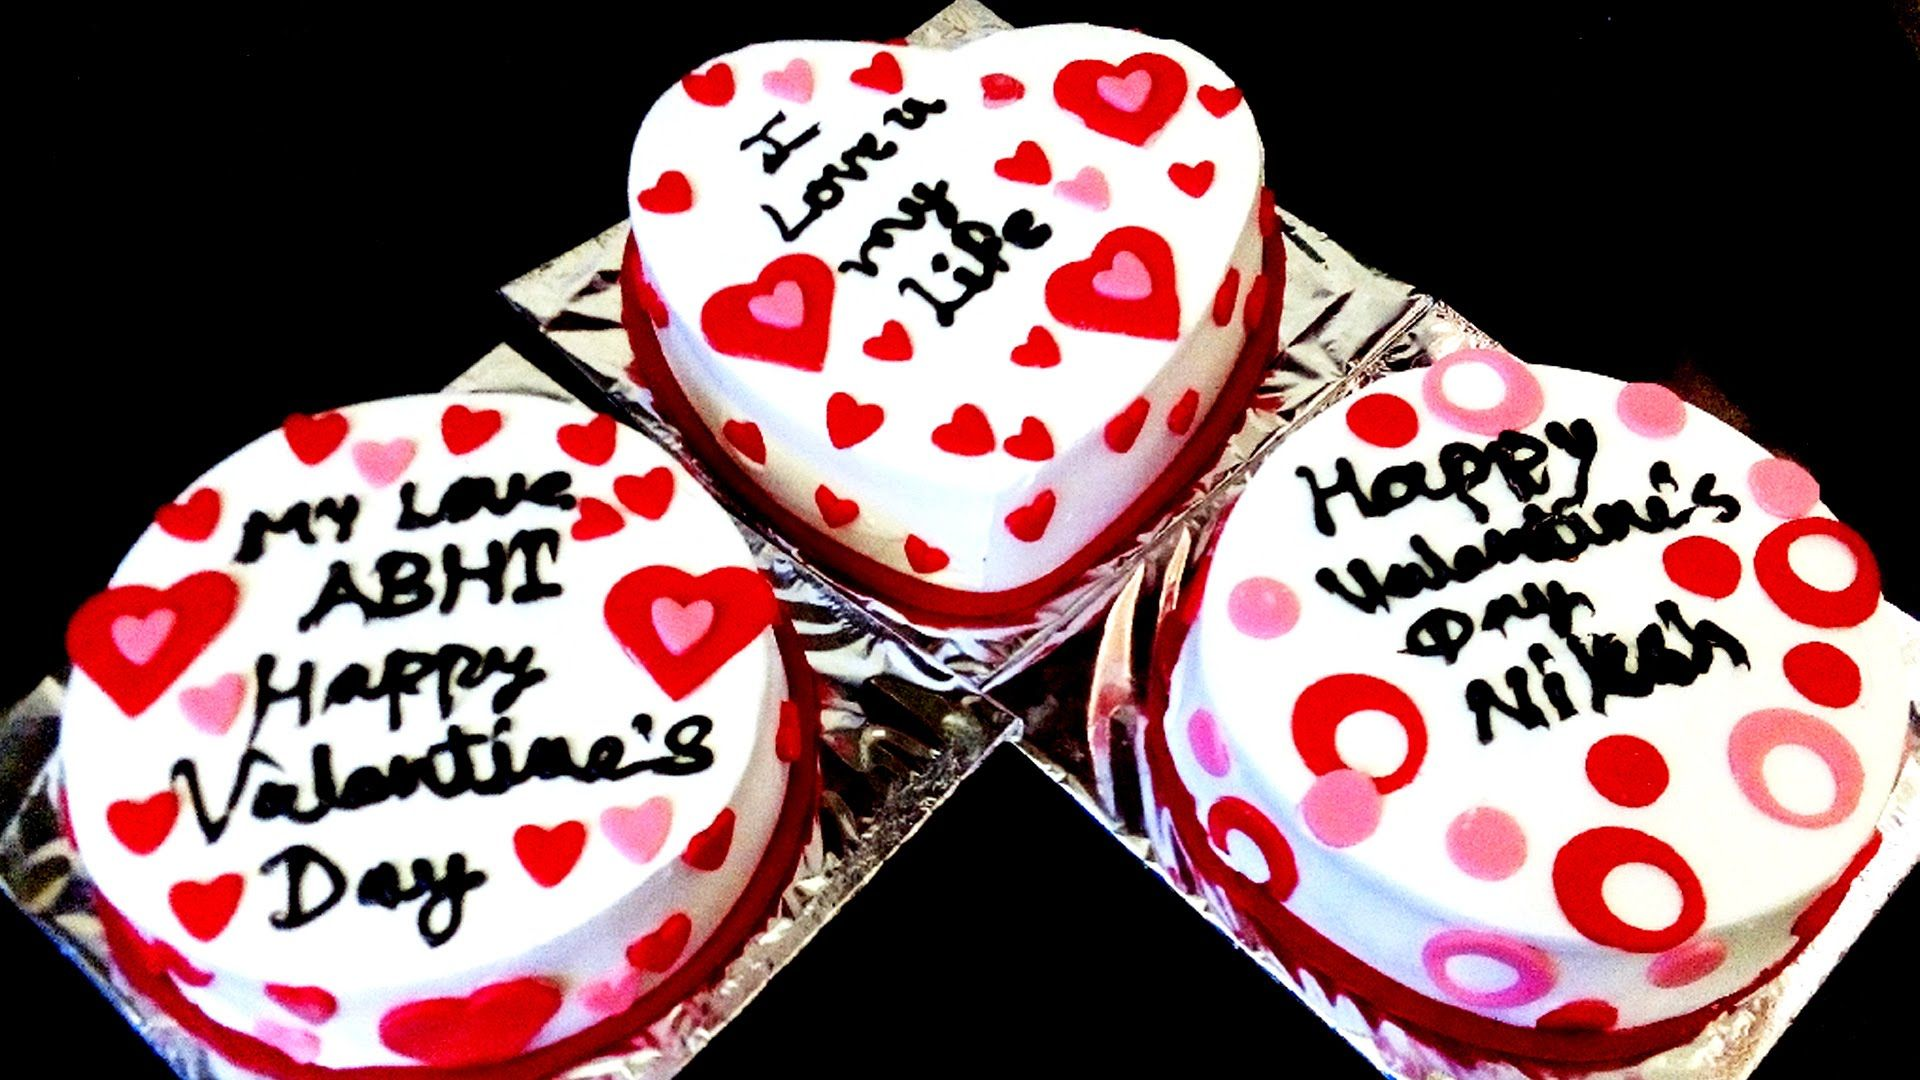 Simple Cake Decoration Valentine S Day Anniversary Cake Design In Hindi Anniversary Cake Designs Anniversary Cake Easy Cake